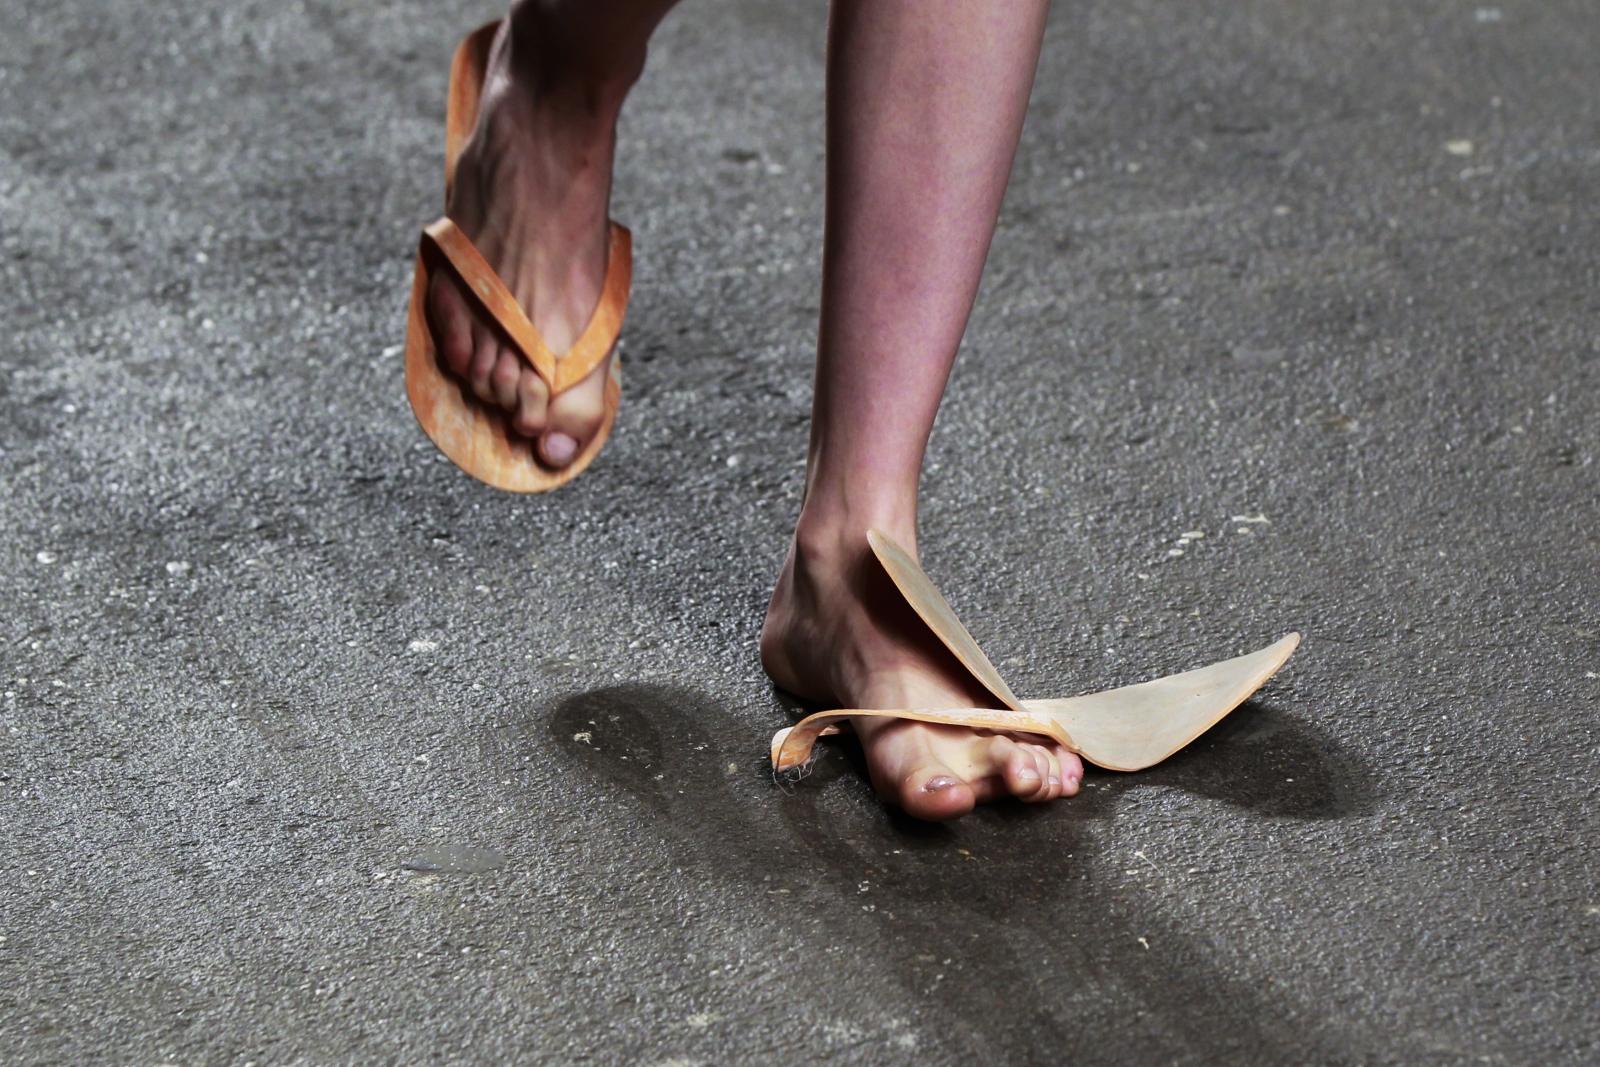 María Lorena Ramírez won 50km race wearing sandals